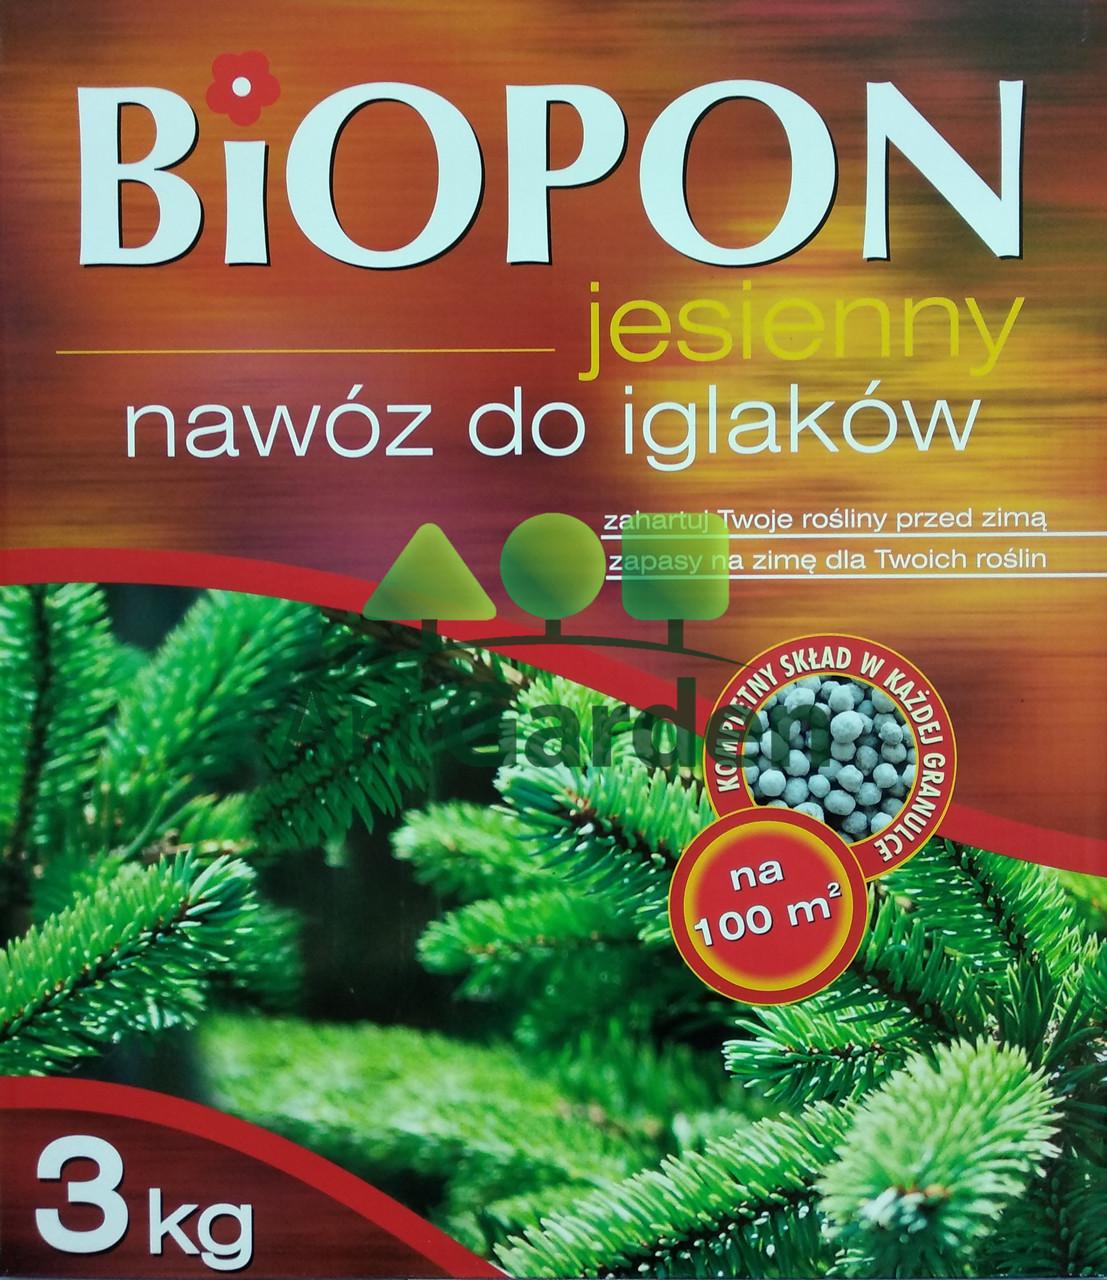 Biopon осеннее для хвойных растений 3кг